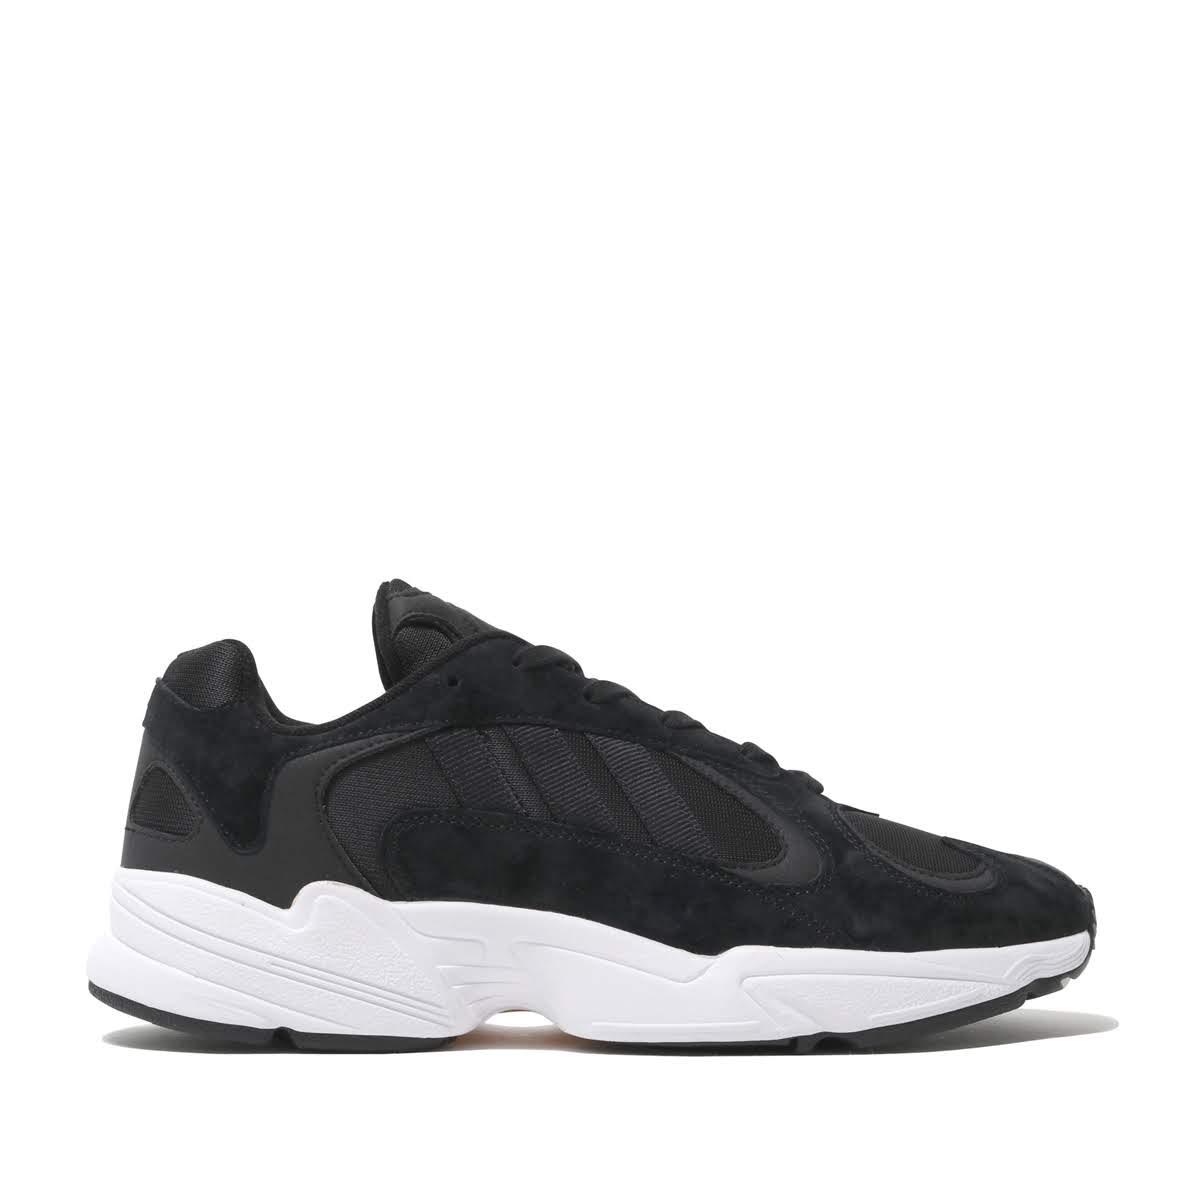 adidas Originals YUNG-1(CORE BLACK/CORE BLACK/RUNNING WHITE)(アディダスオリジナルス ヤング-1)【メンズ】【レディース】【スニーカー】【19SS-I】